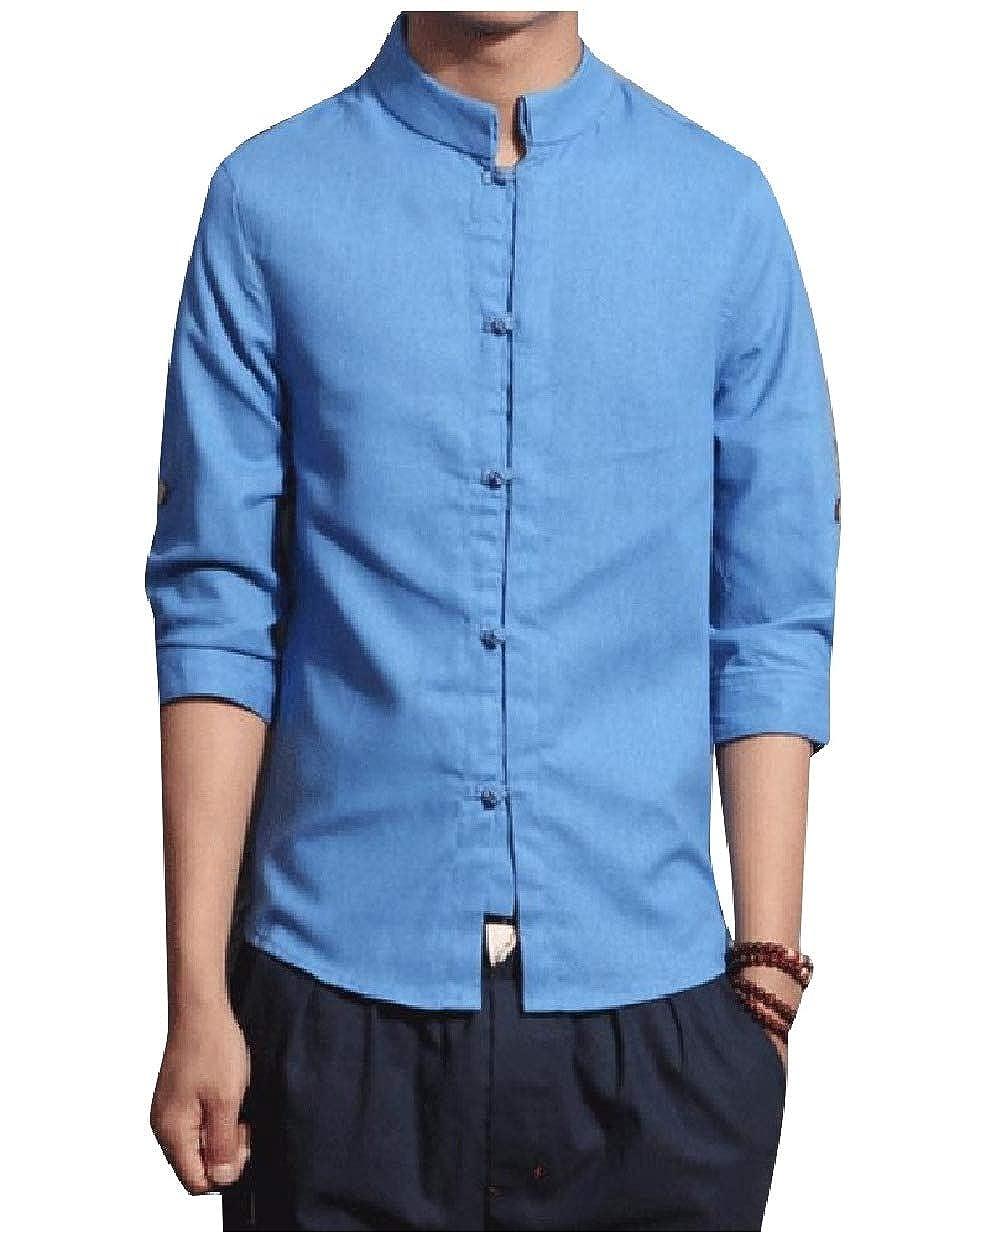 Sebaby Mens Stand Collar Cotton Linen Slimming Button-Front Shirt Tops